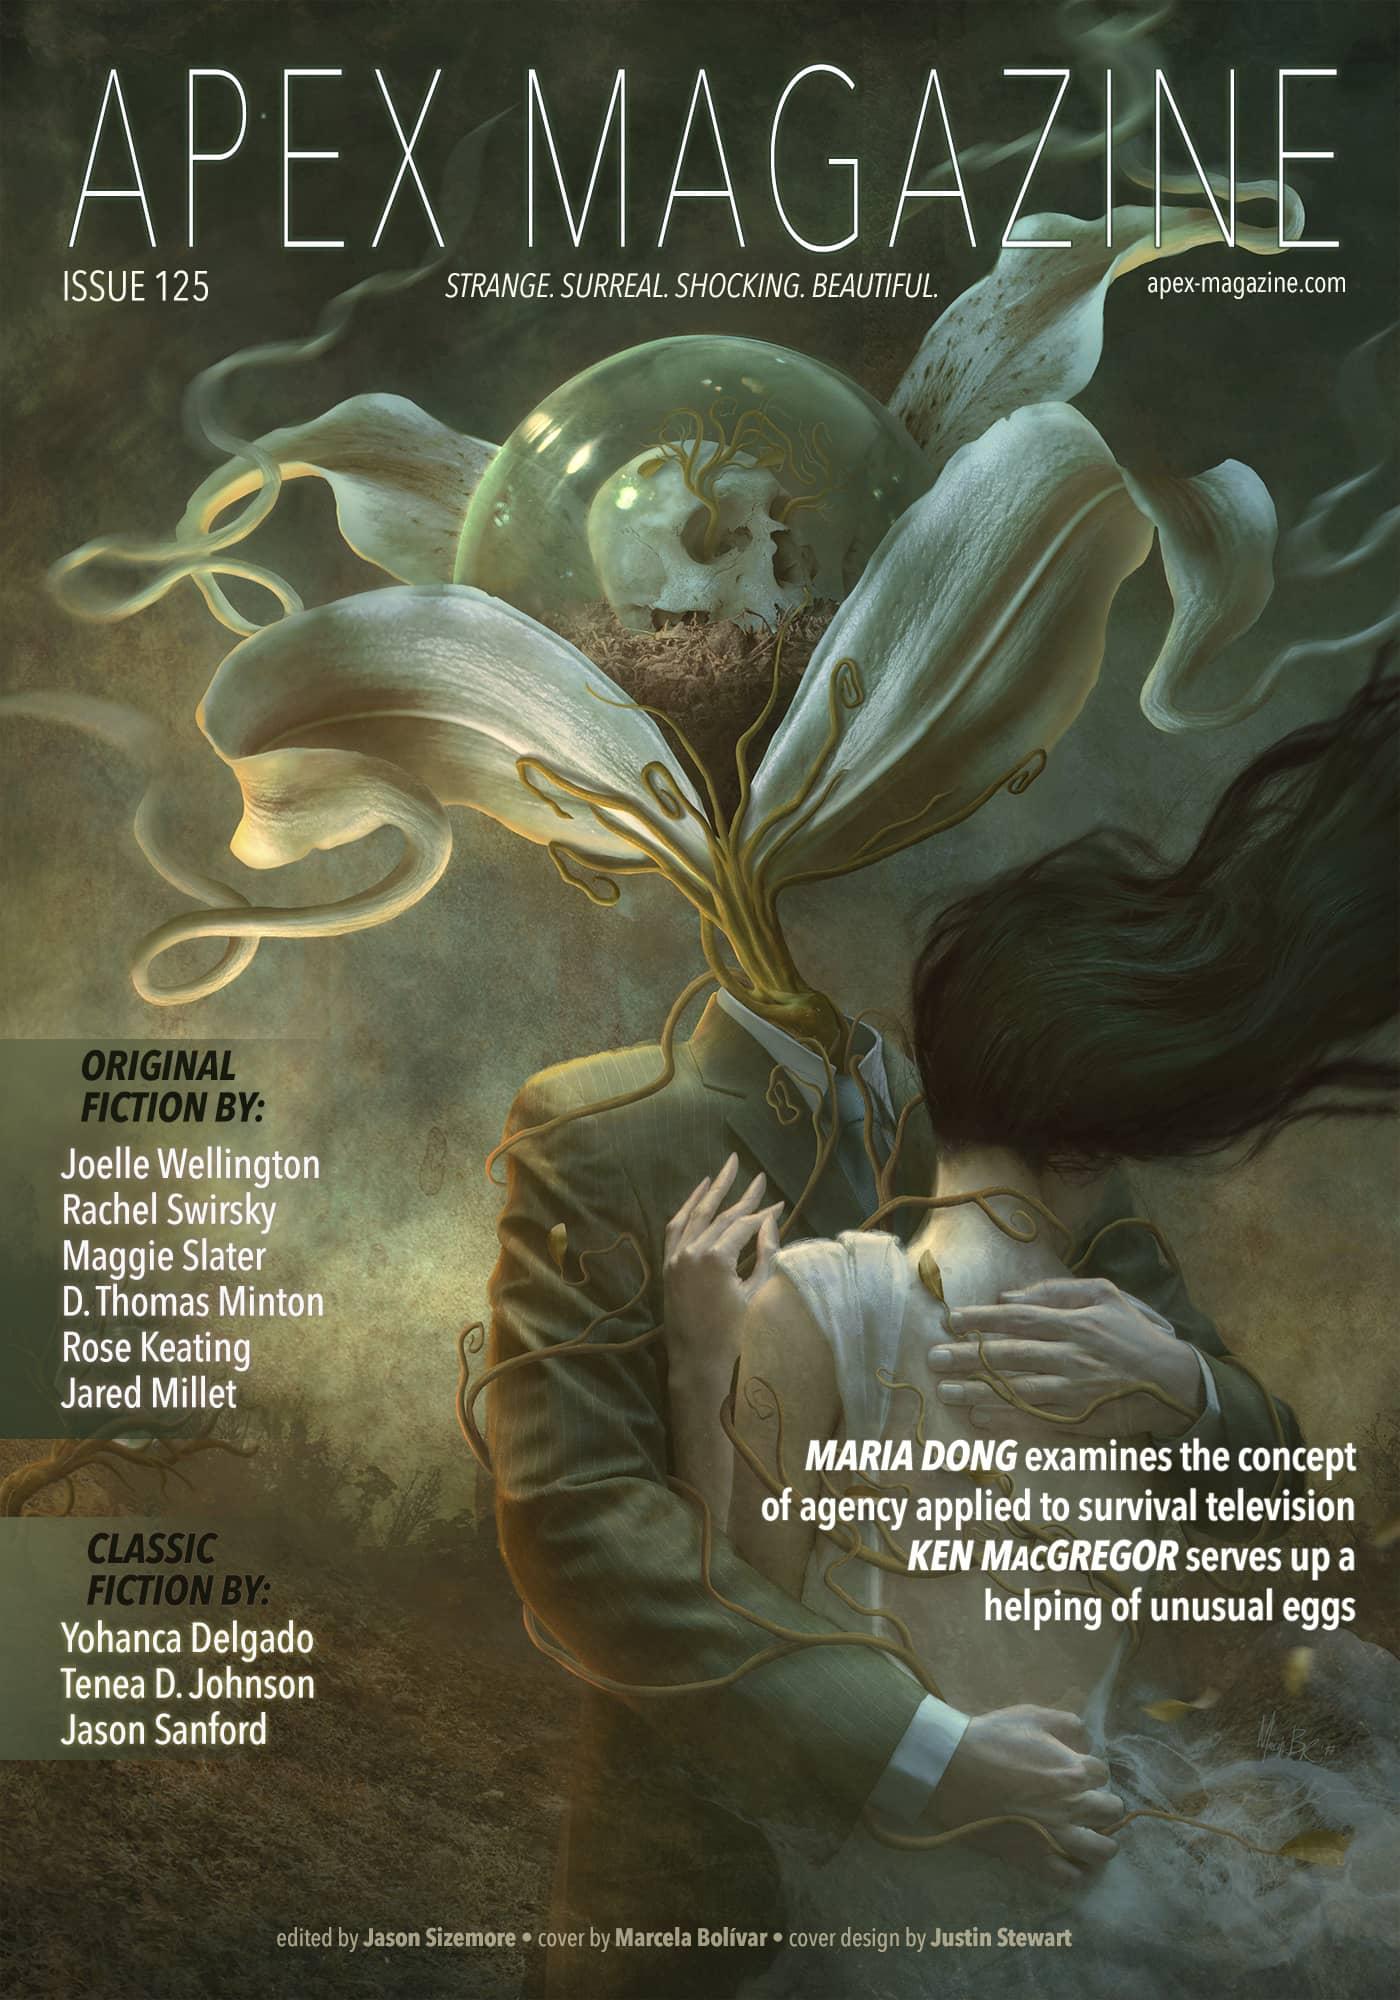 Apex Magazine Issue 125 by Jason Sizemore